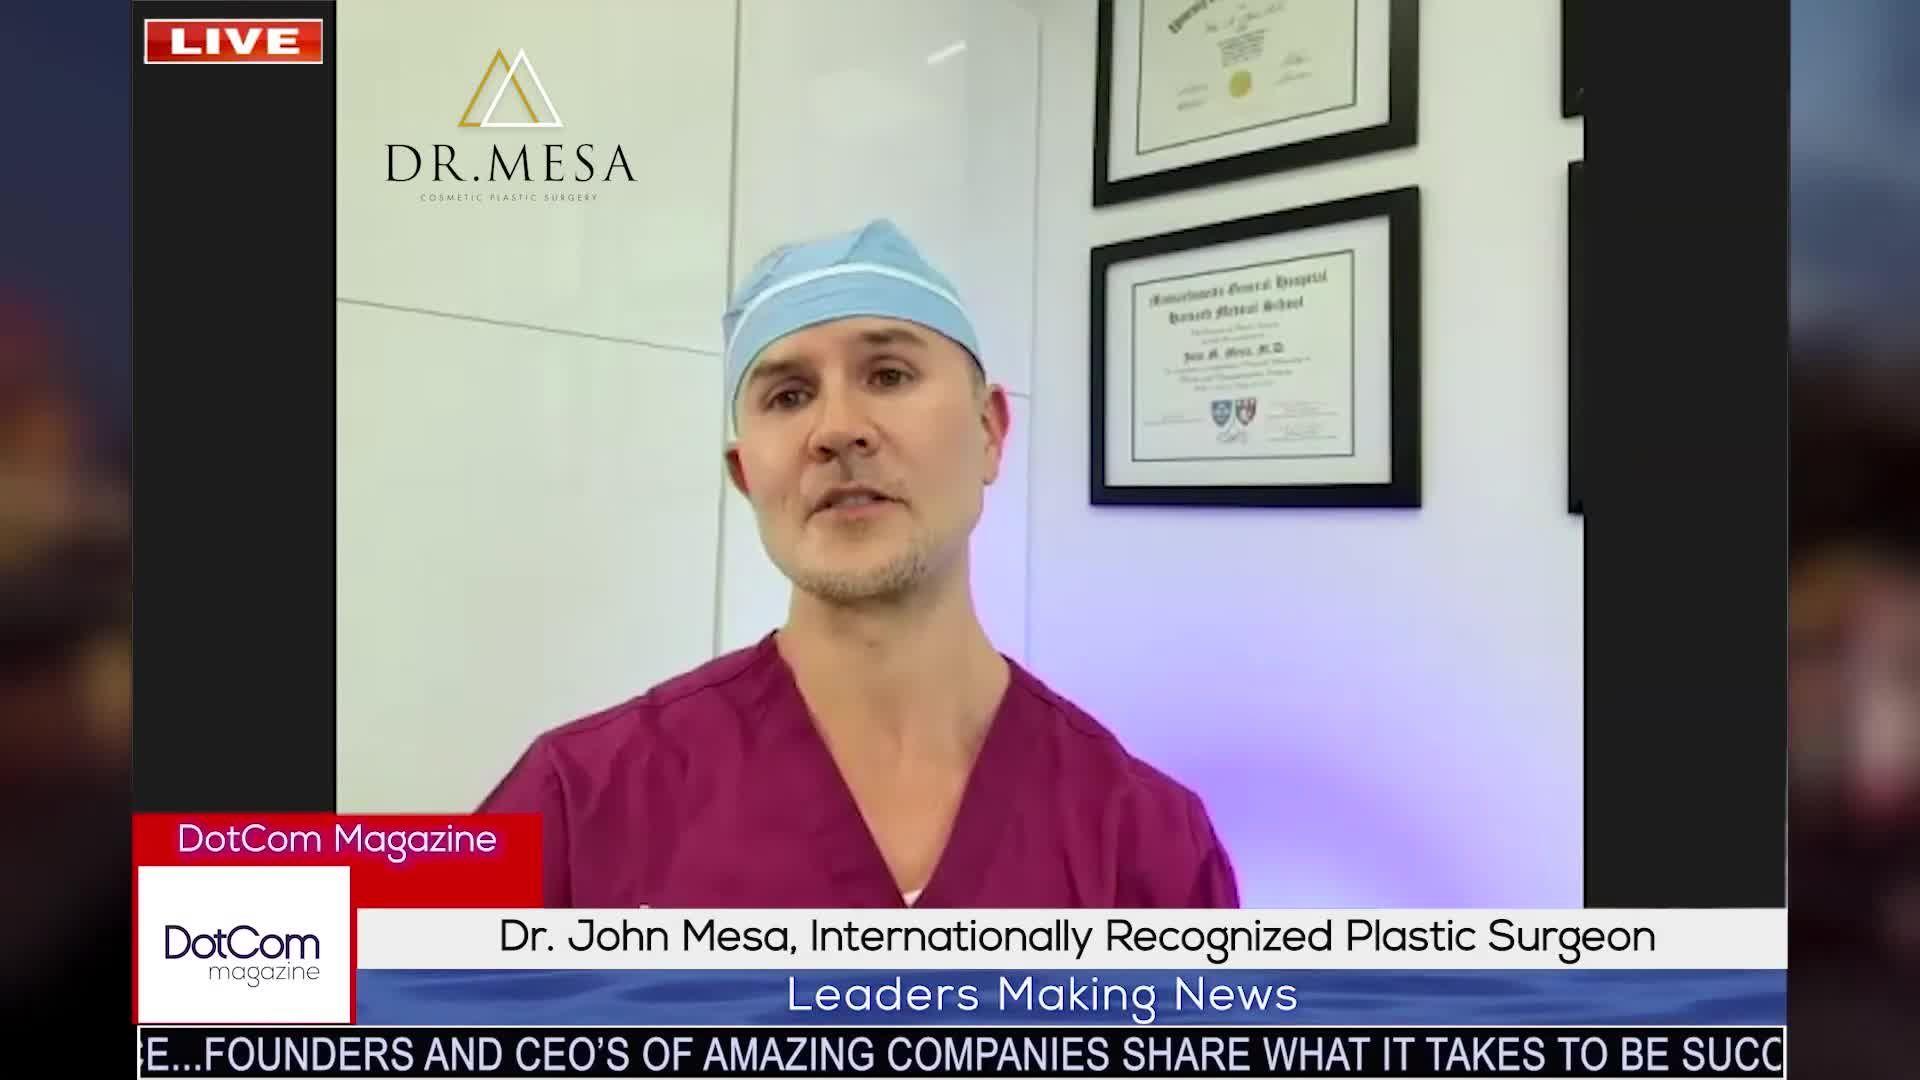 Dr. John Mesa, Internationally Recognized Plastic Surgeon, A DotCom Magazine Exclusive Interview